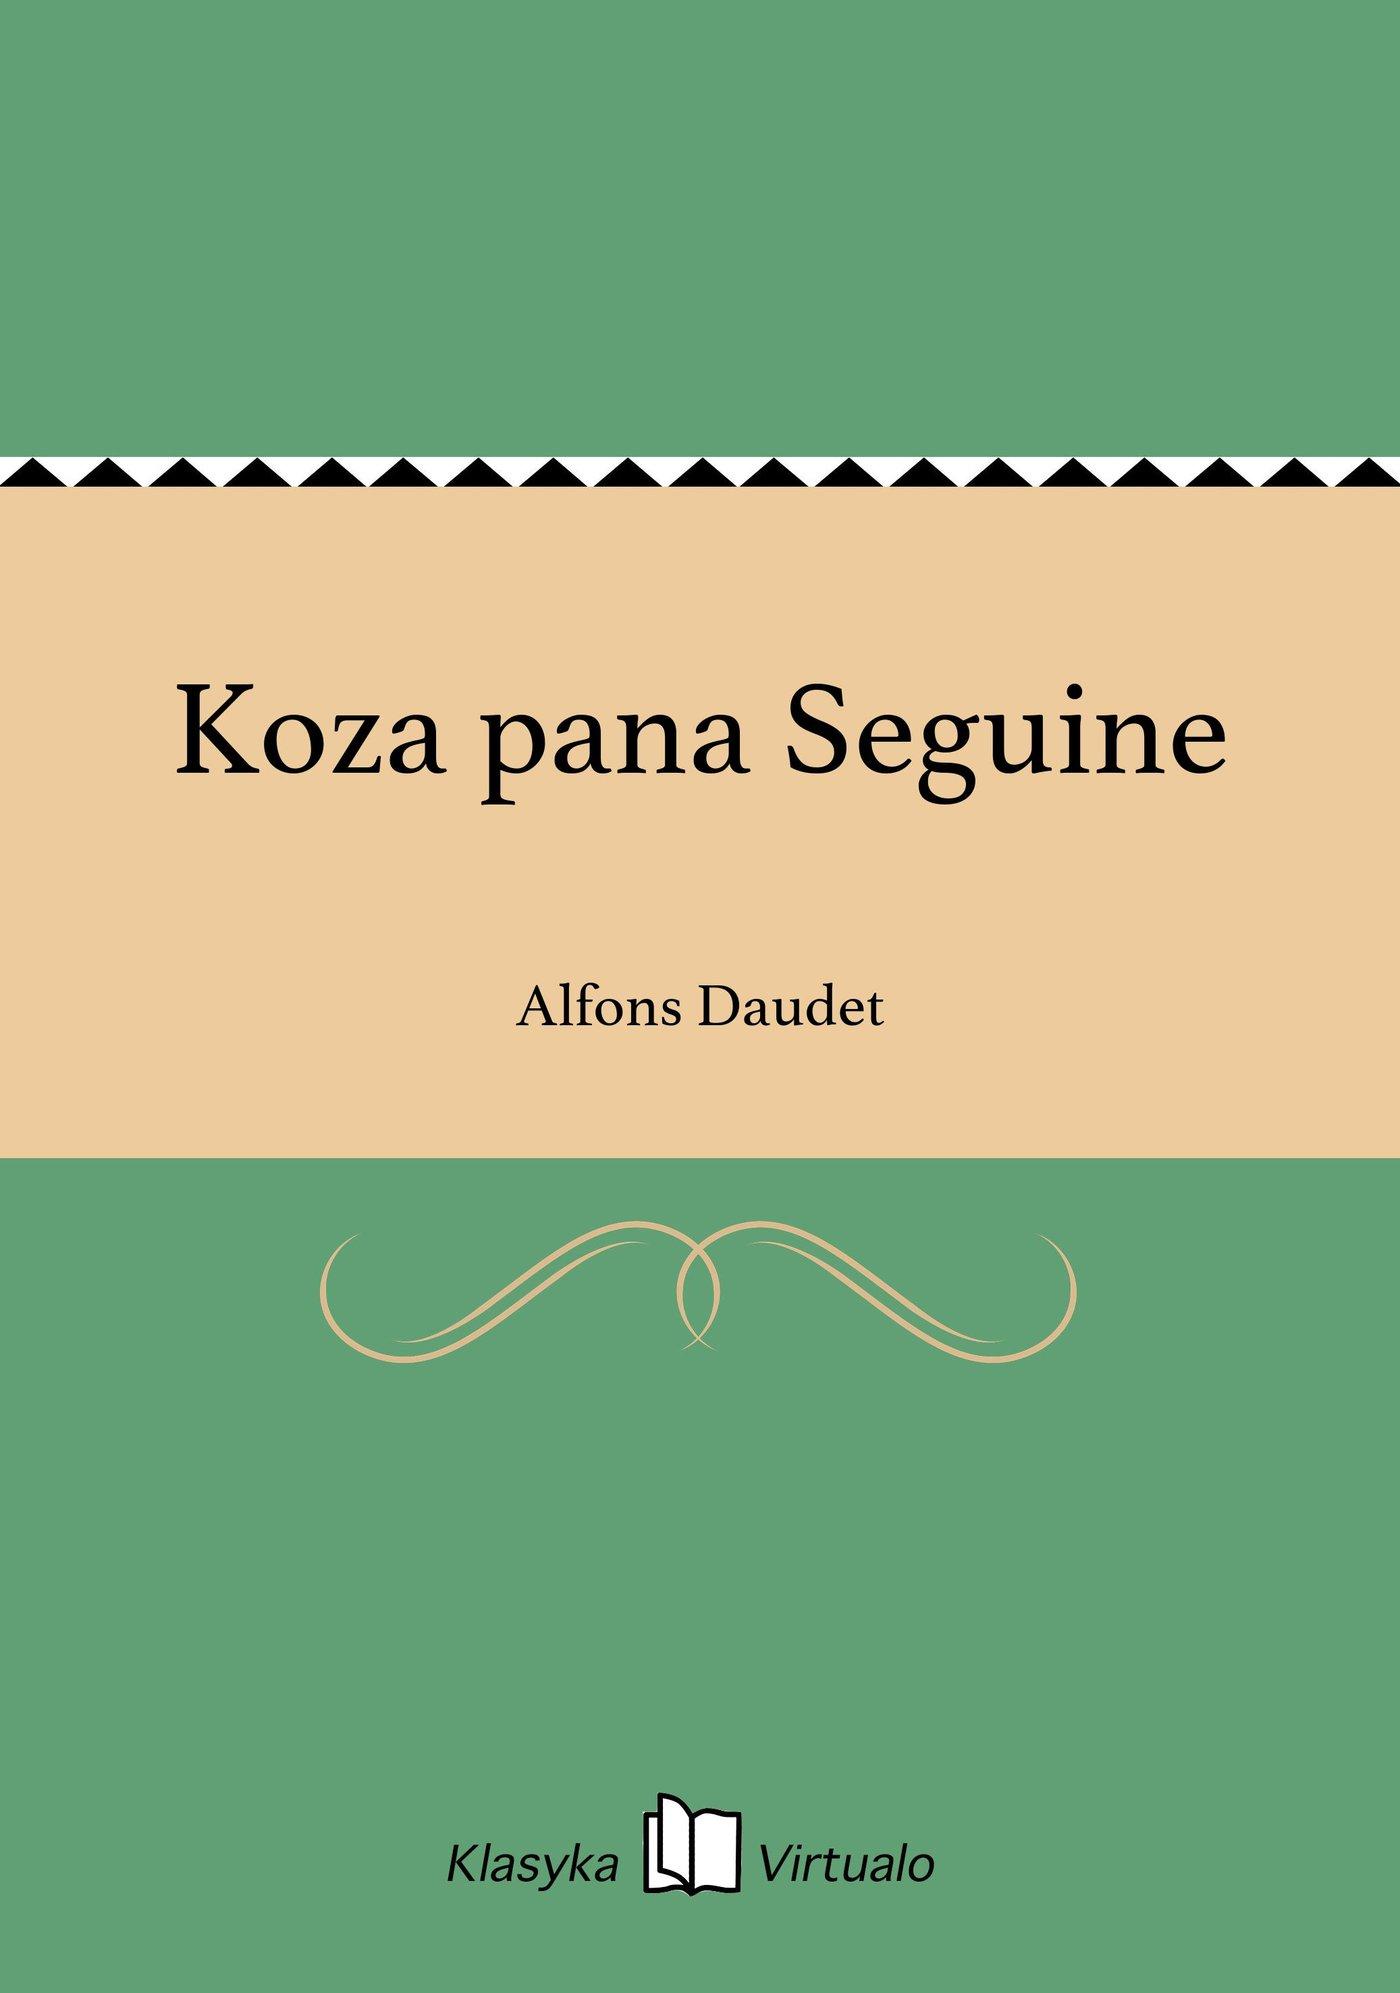 Koza pana Seguine - Ebook (Książka EPUB) do pobrania w formacie EPUB